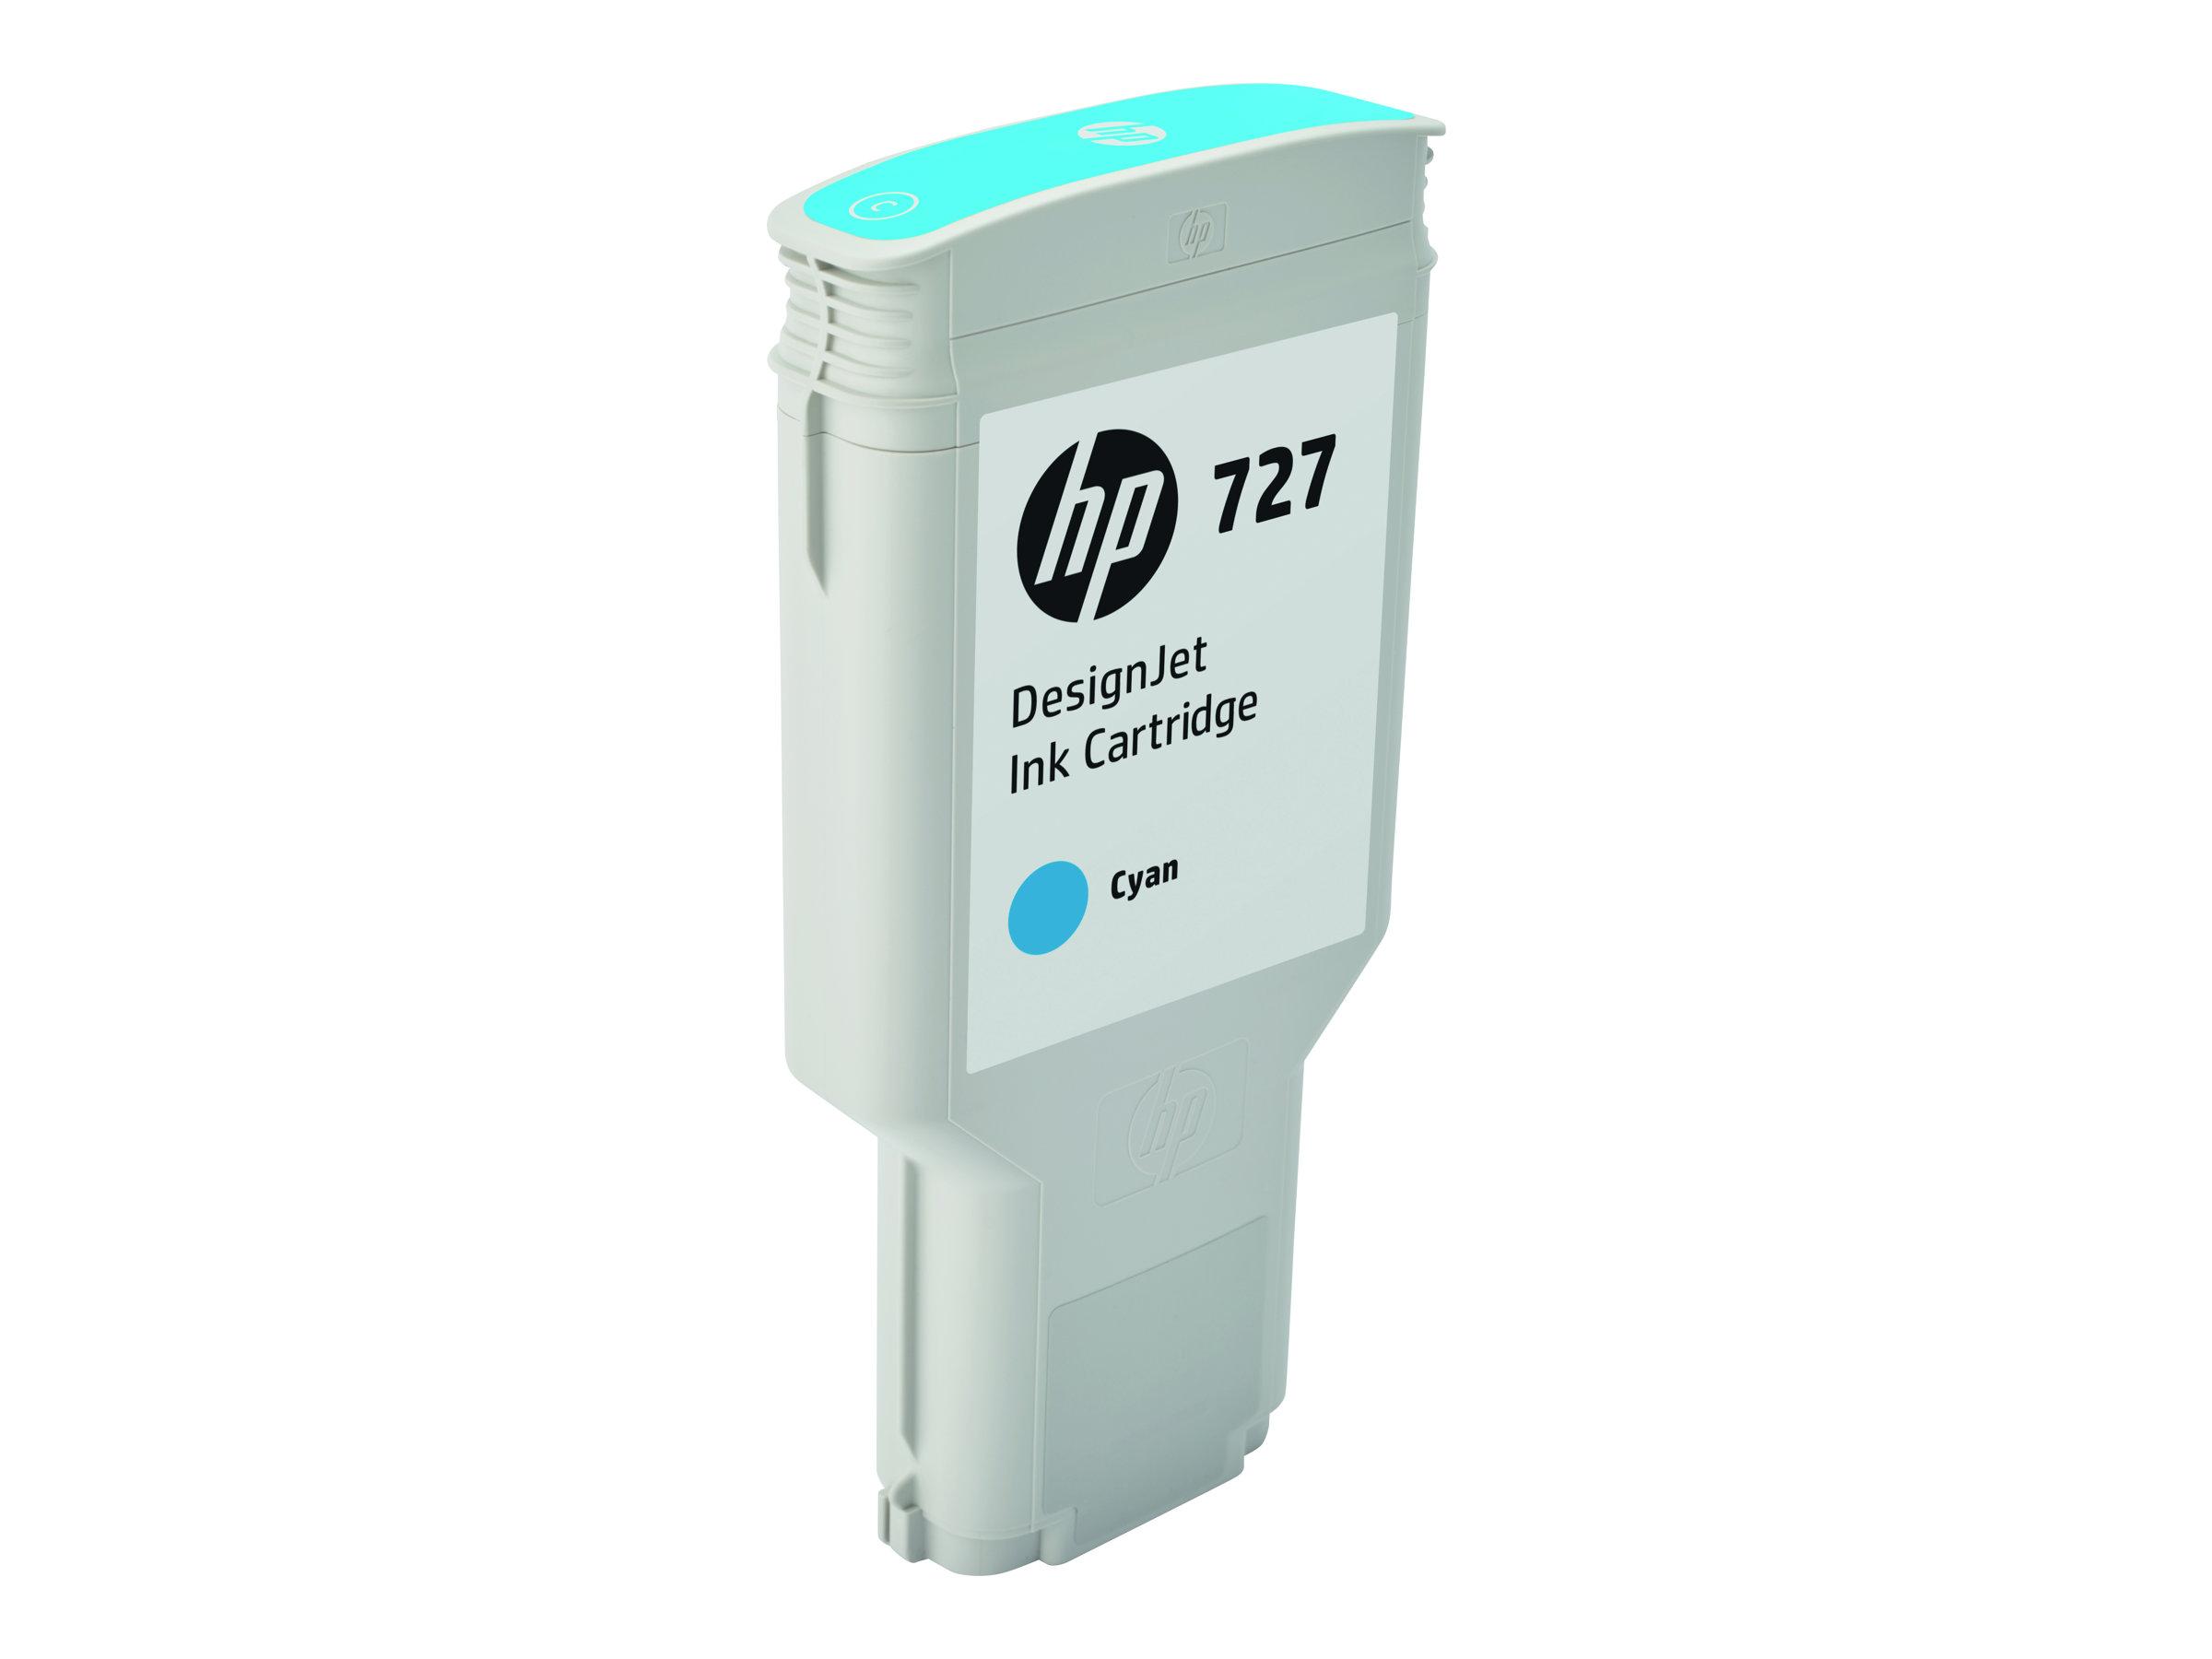 HP 727 - 300 ml - mit hoher Kapazität - Dye-Based Cyan - Original - DesignJet